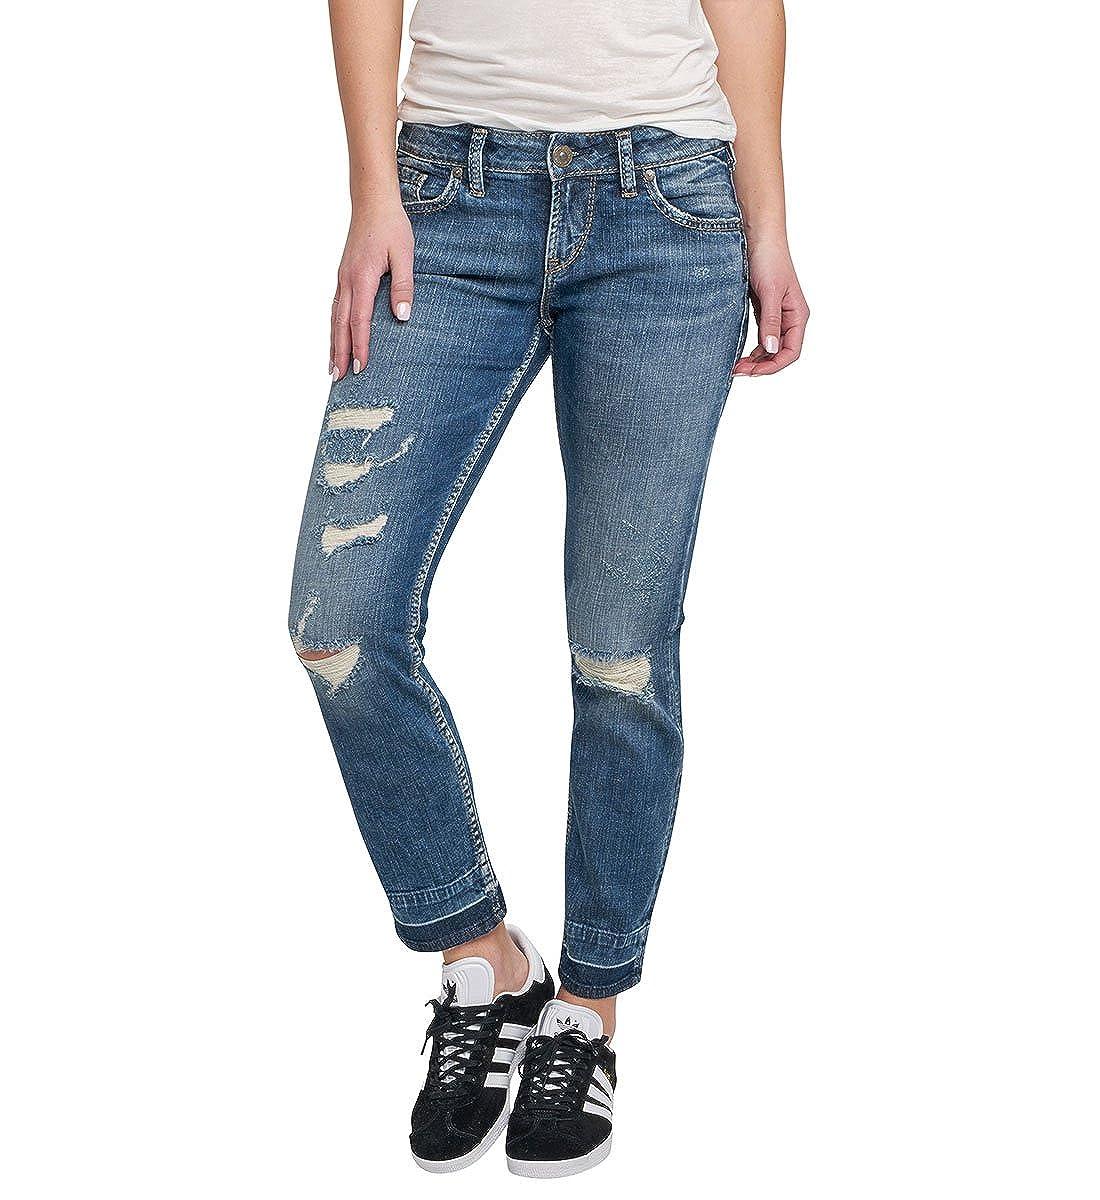 f8a7b29f55a29 Amazon.com  Silver Jeans Co. Women s Sam Mid Rise Boyfriend Jeans  Clothing